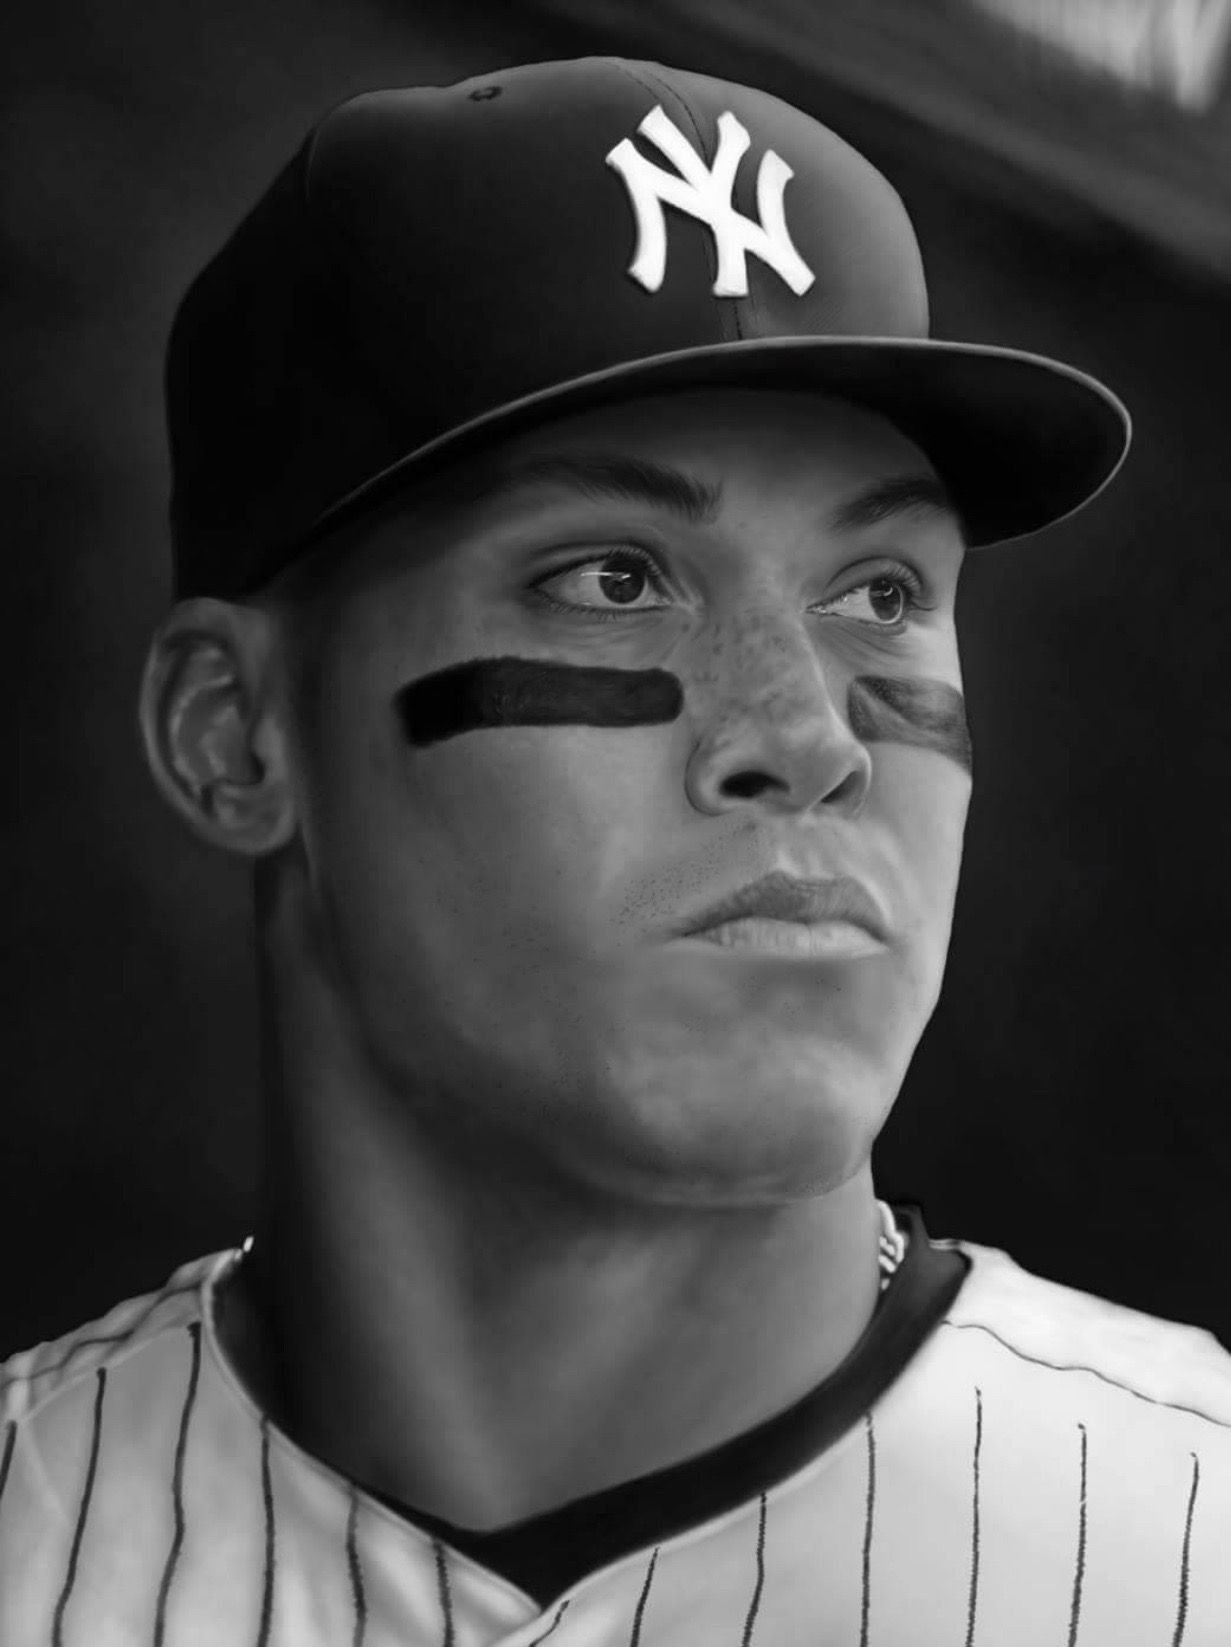 Aaron Judge NY Yankees Rookie season 2017 ...